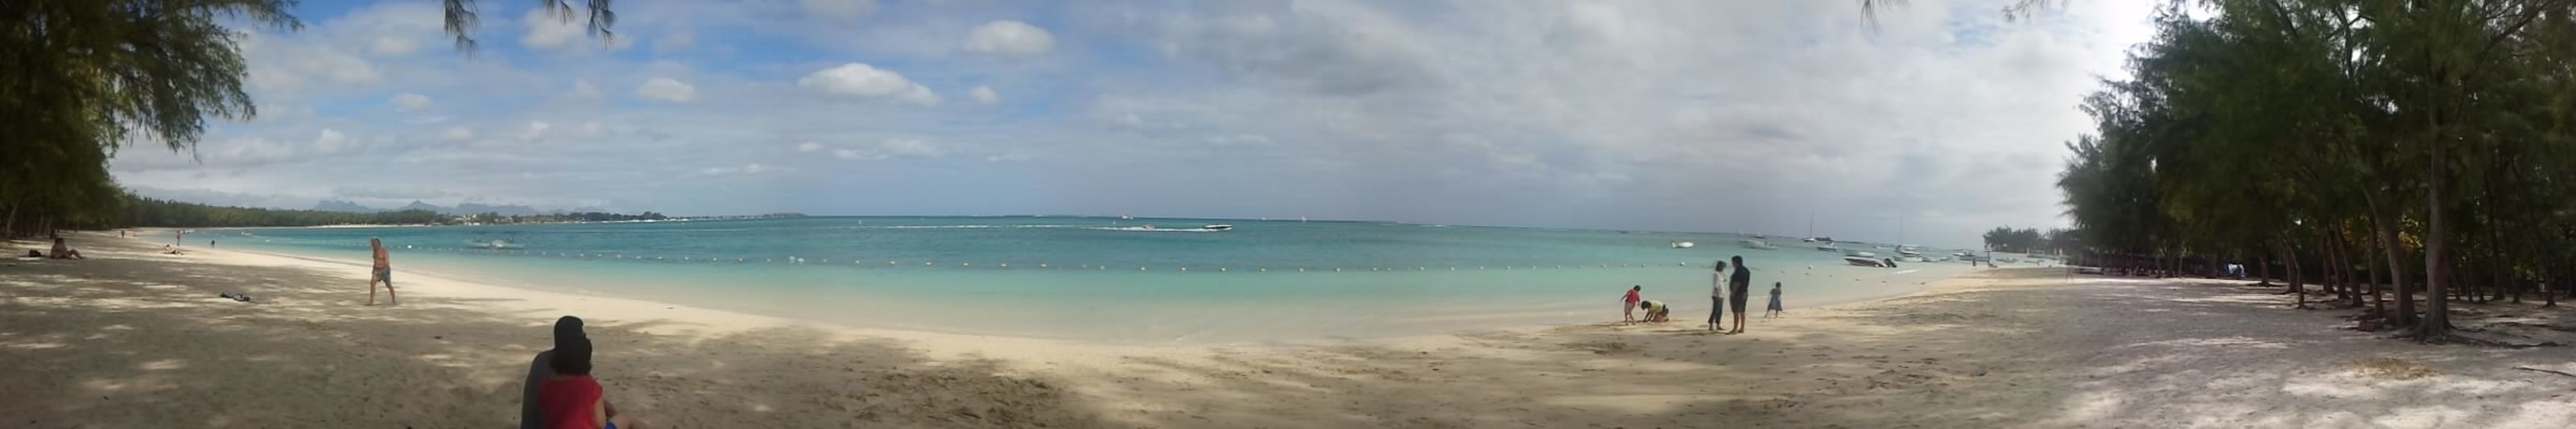 """Take me back, back to summer paradise"" Mauritius Summer Sea Beach"